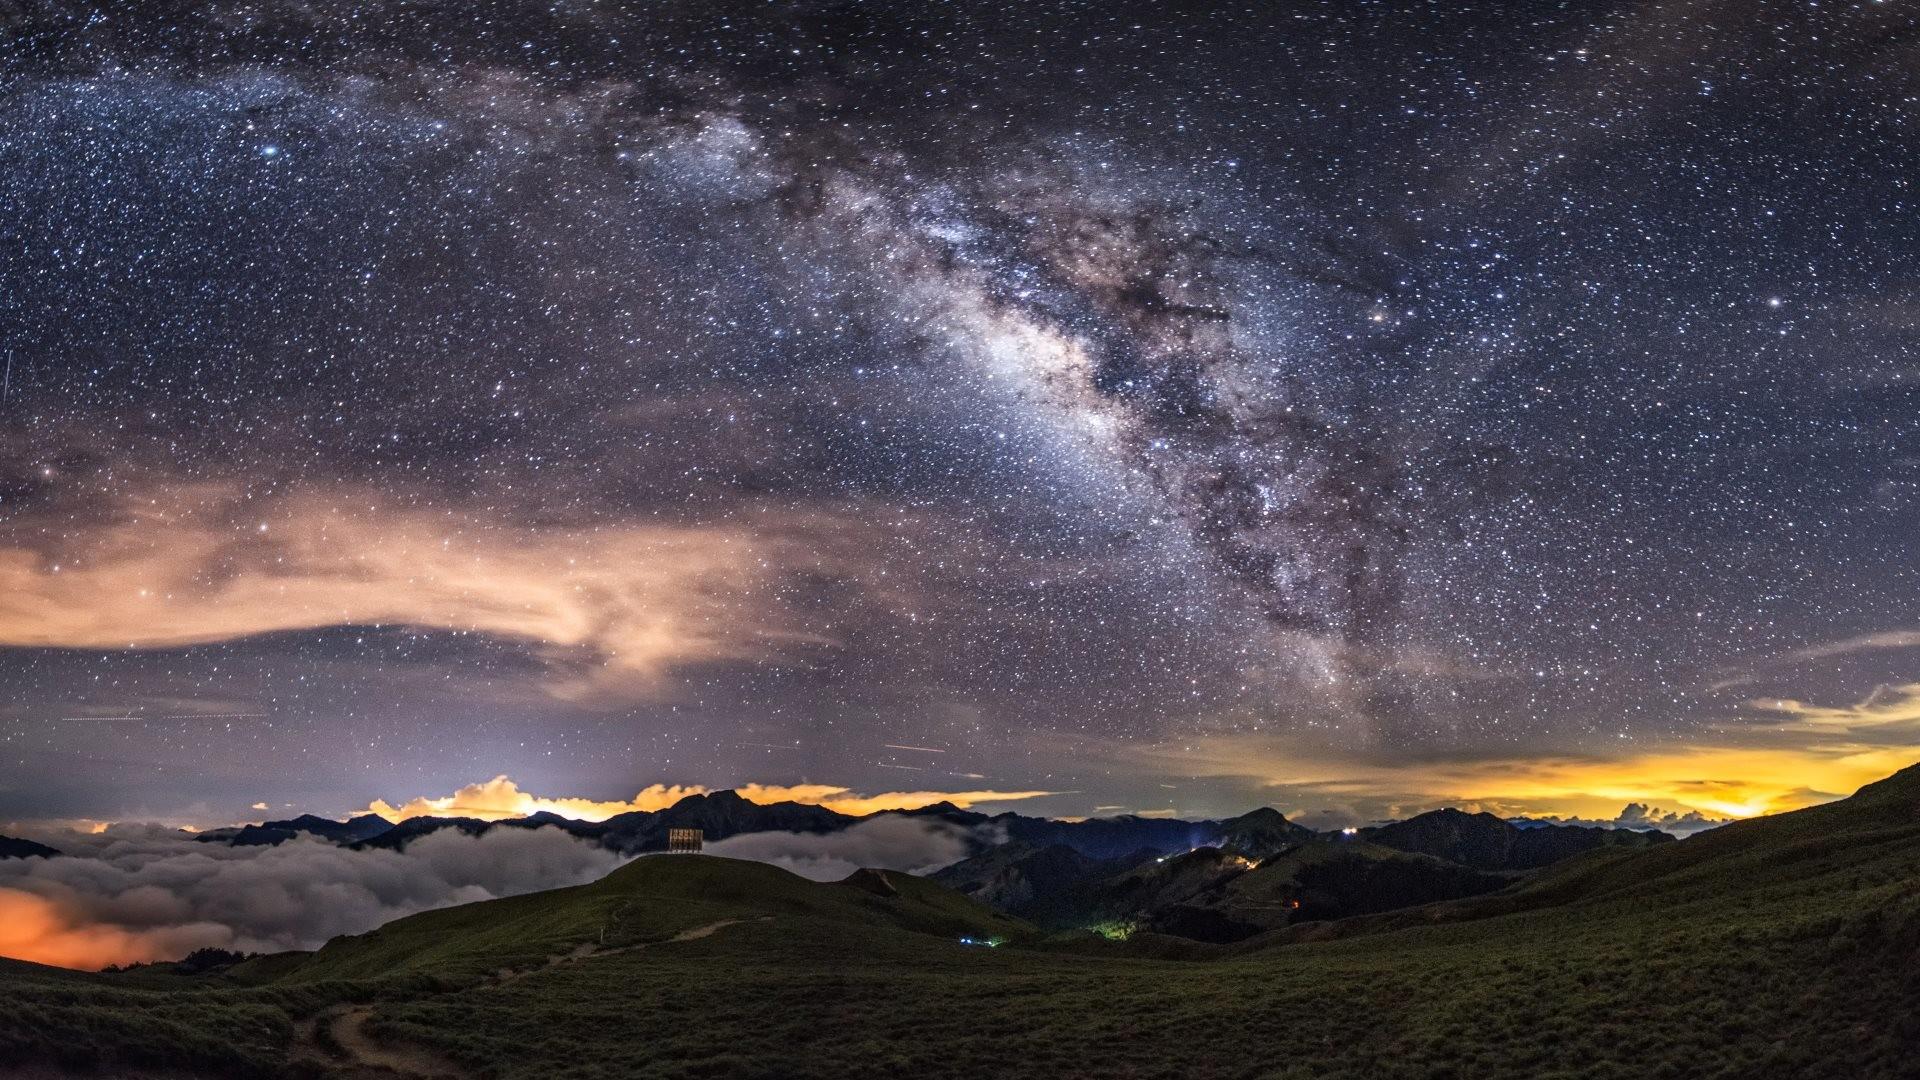 4K HD Wallpaper: Milky Way on the Night Sky